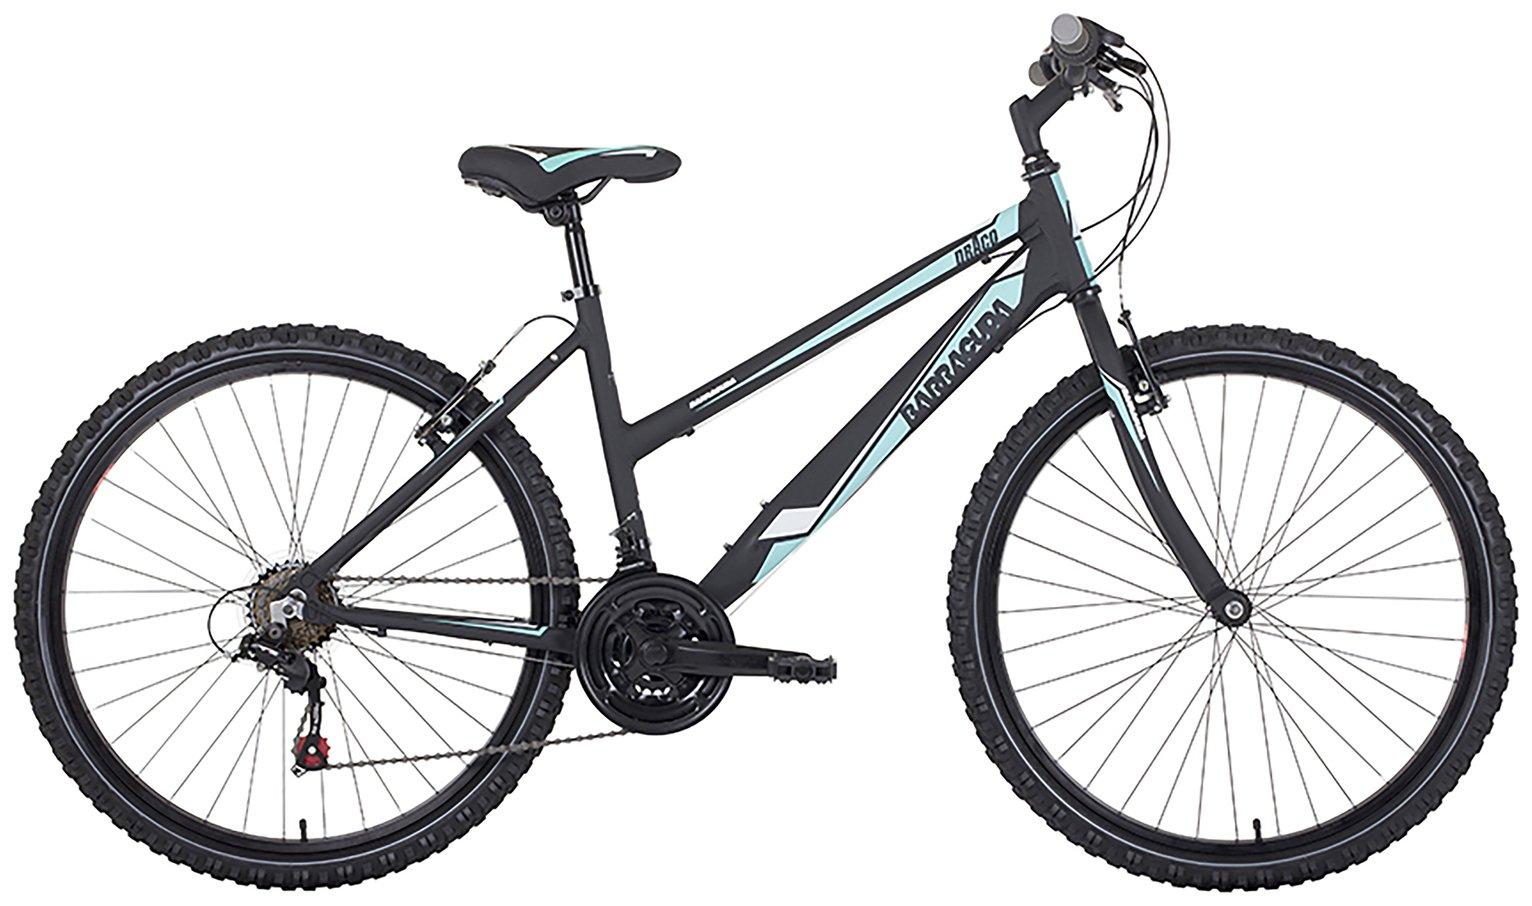 Barracuda Draco 1 15 Inch Black Mountain Bike - Womens. Review thumbnail